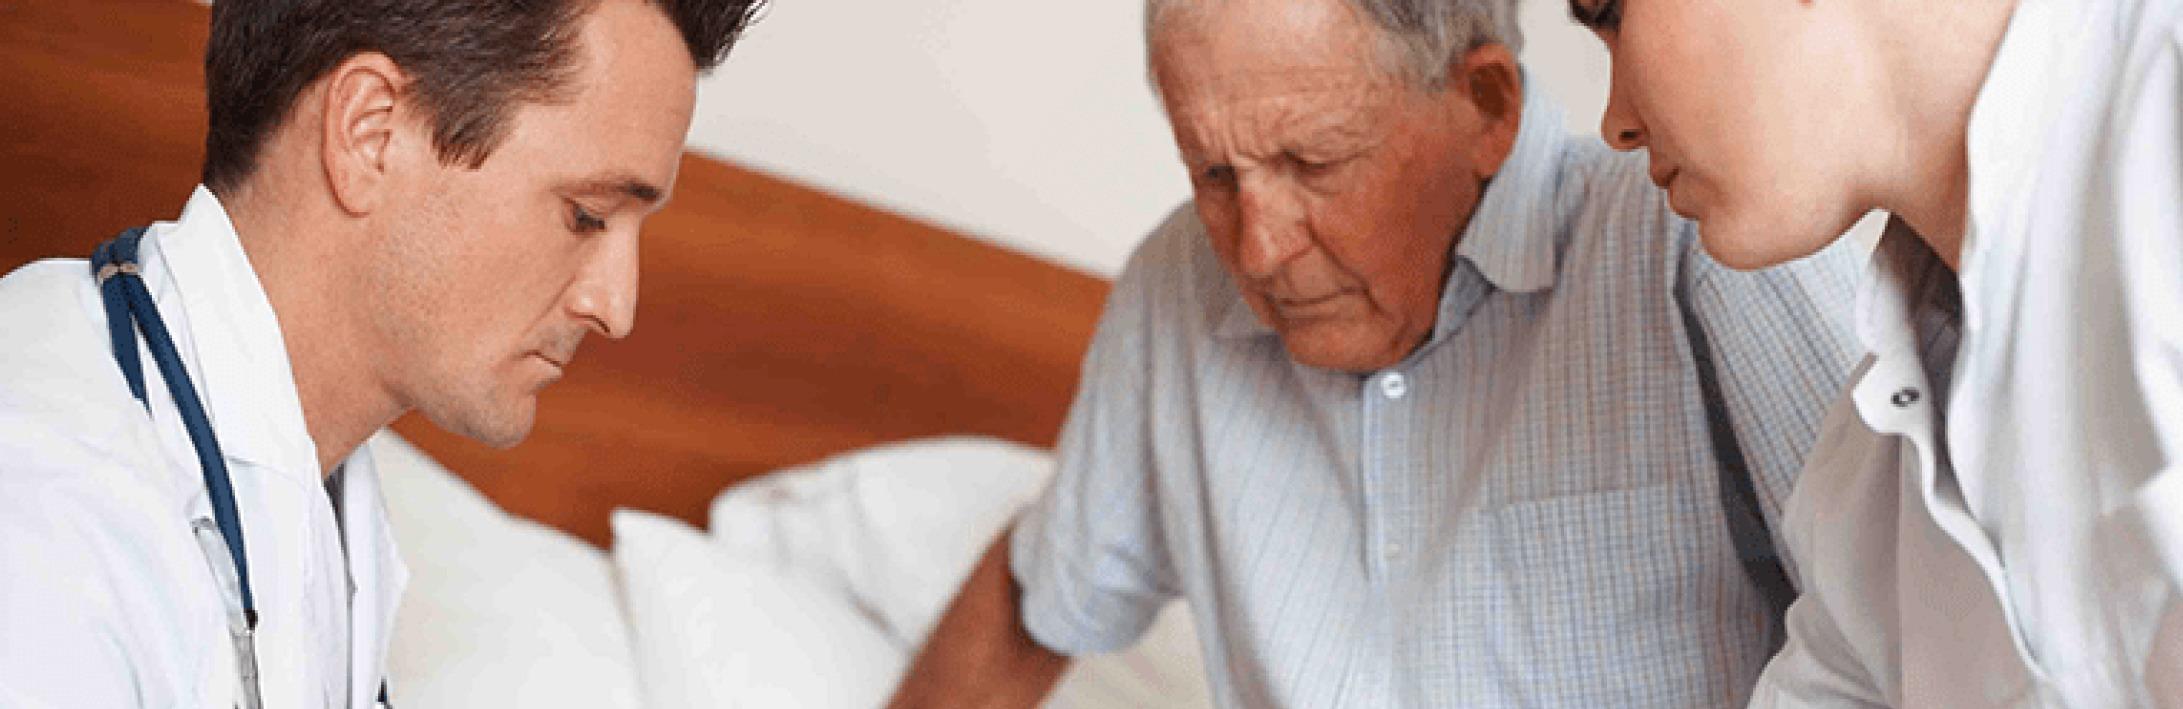 12 aplicativos para Ortopedistas